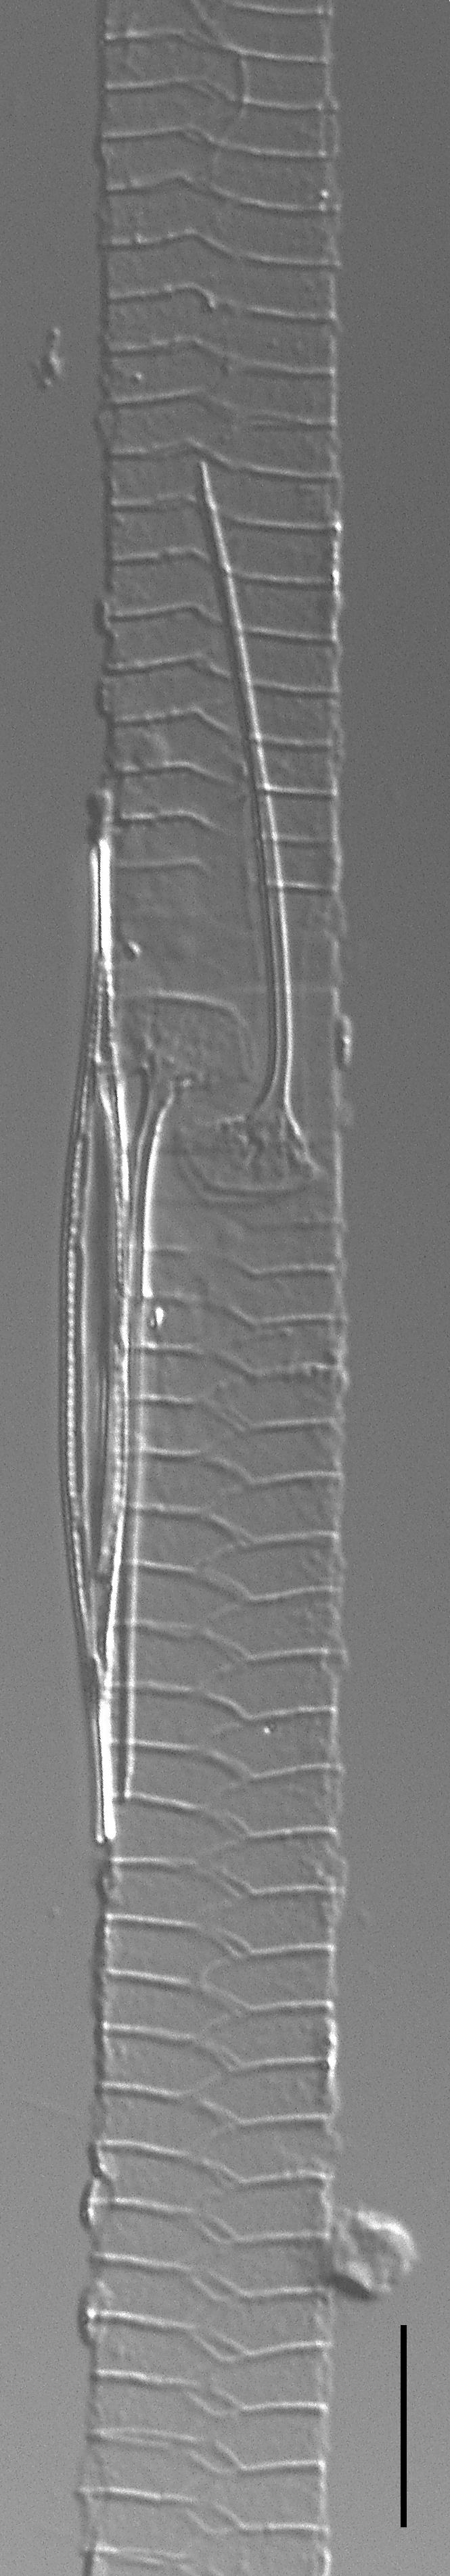 Urosolenia Eriensis Lm7B